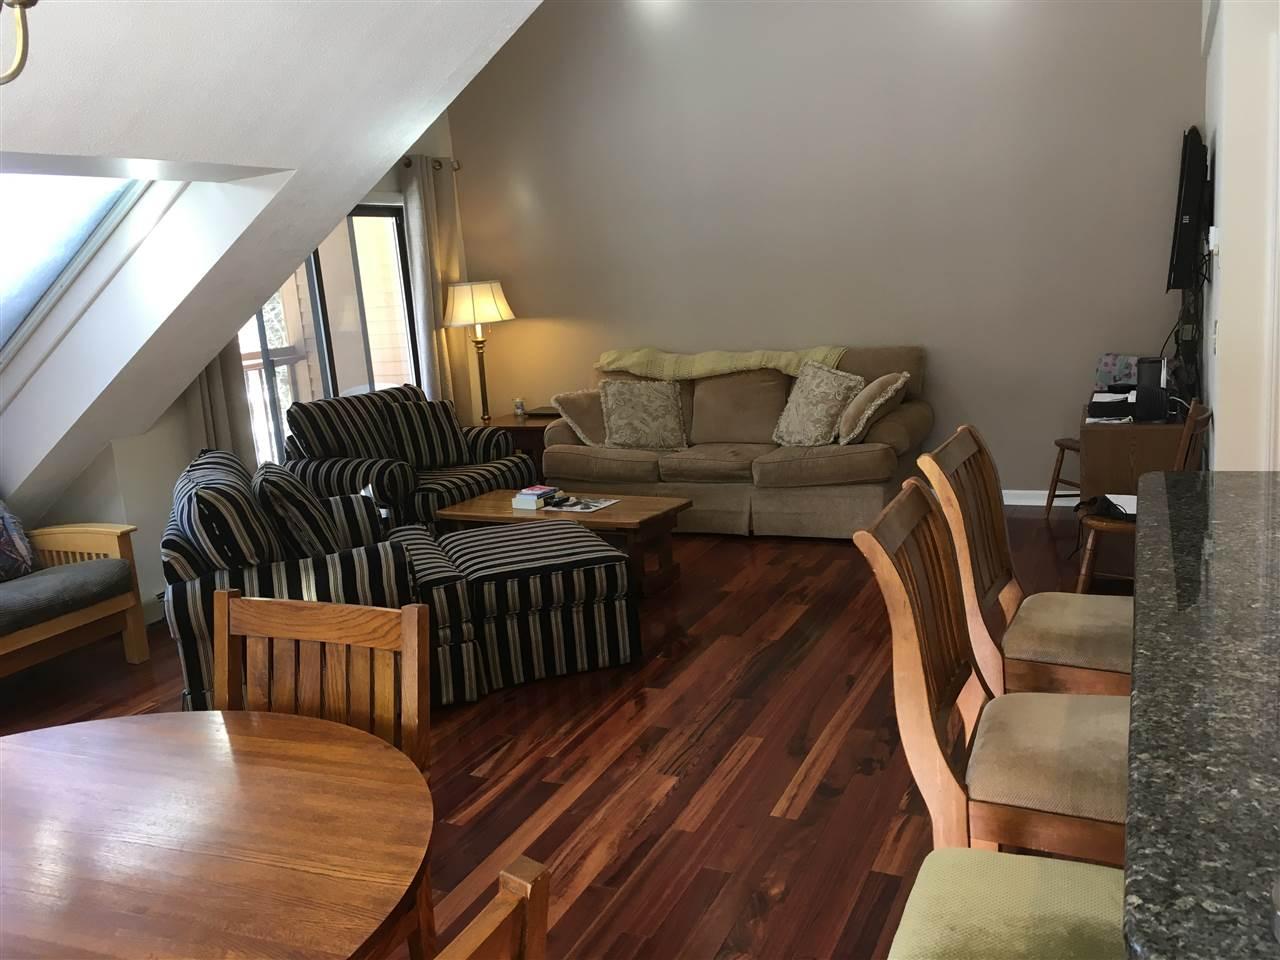 Mount-Snow-Real-Estate-4617963-8